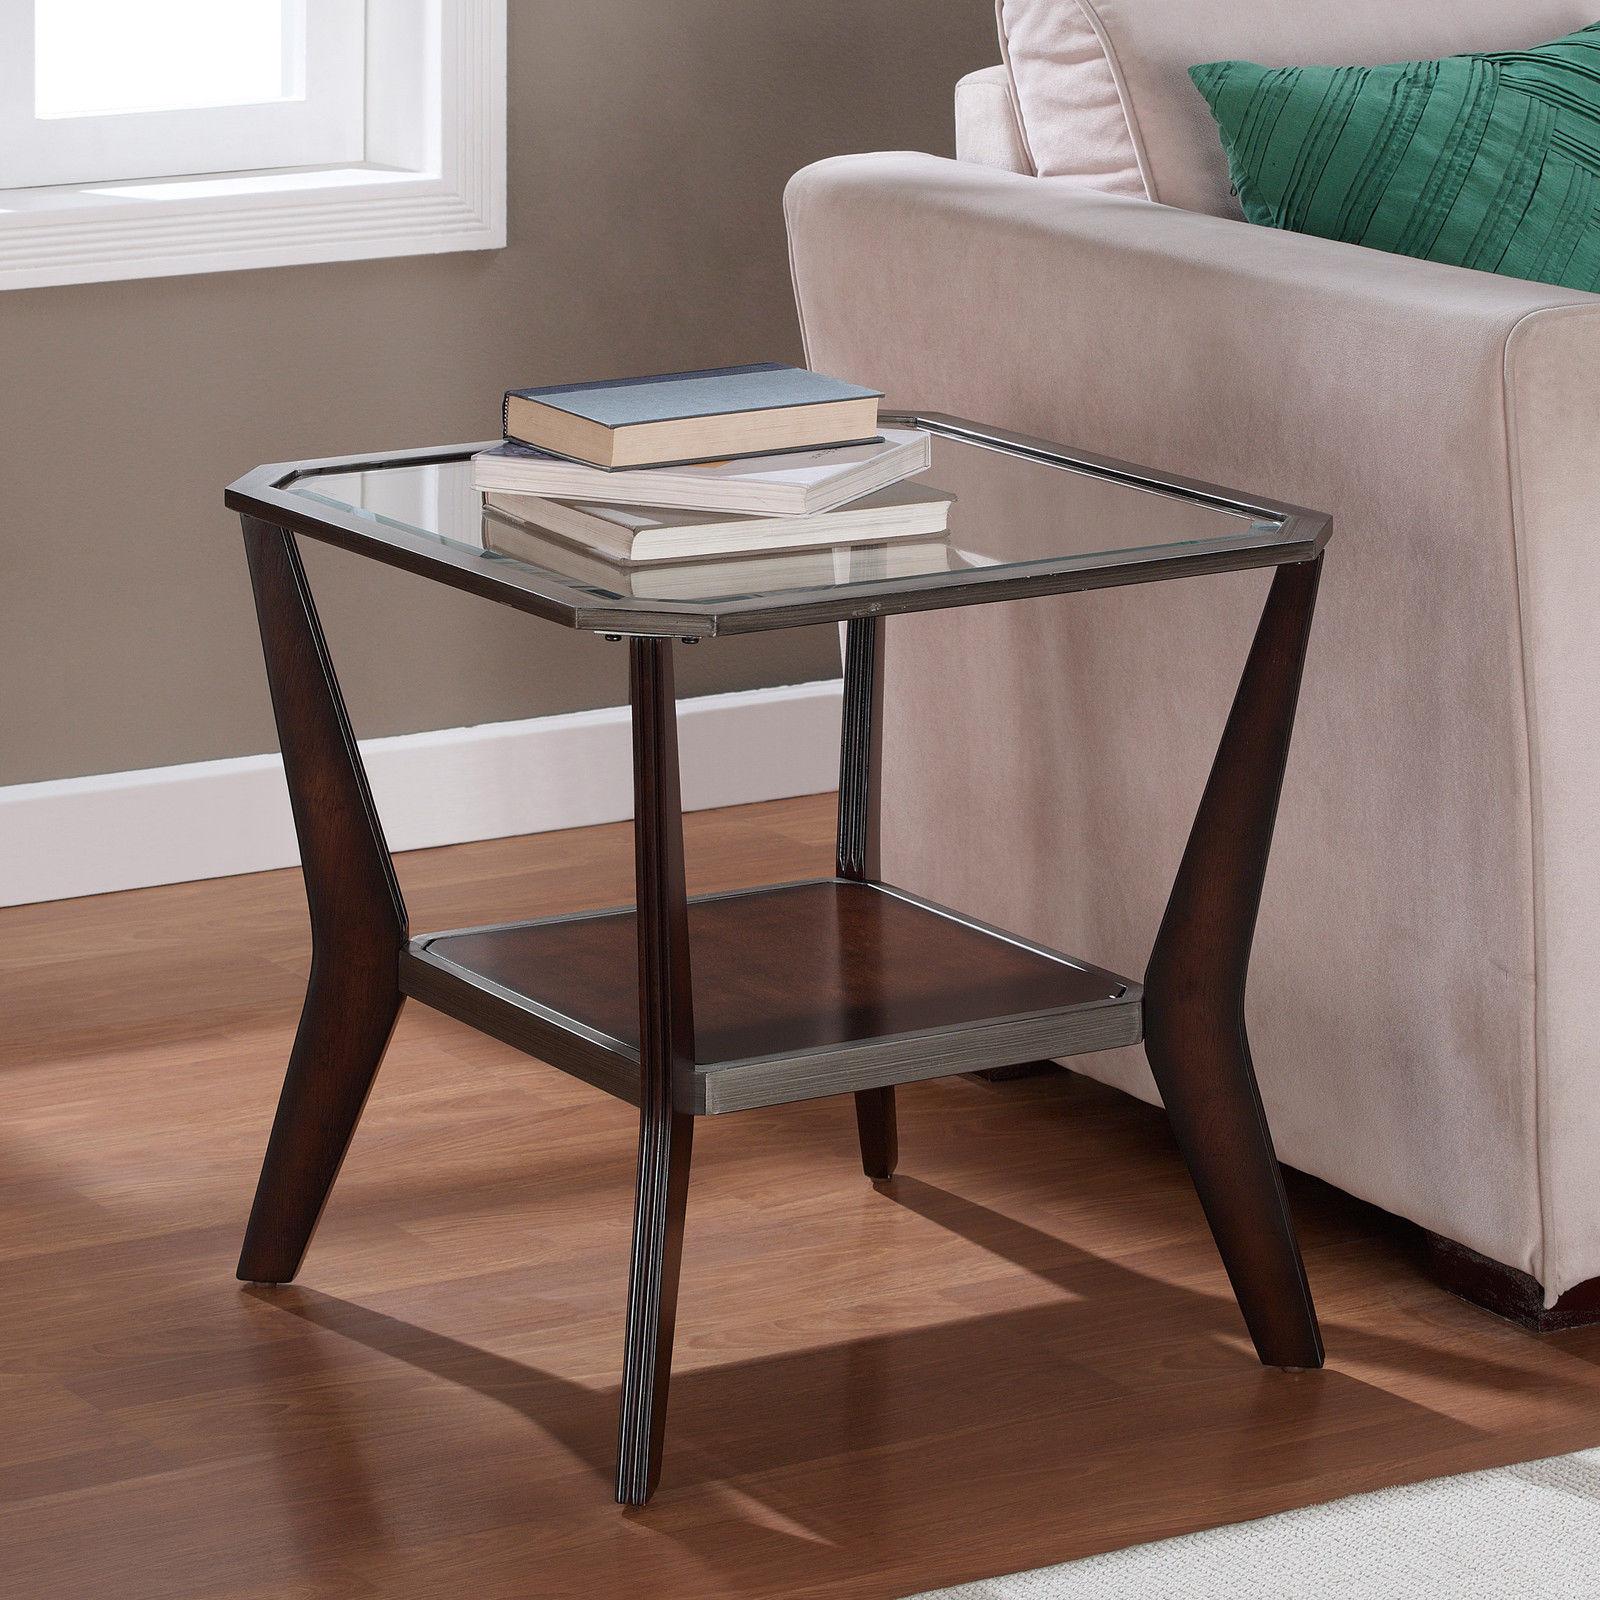 ... stylish design contemporary side tables for living room livingroom end QSKVKAV